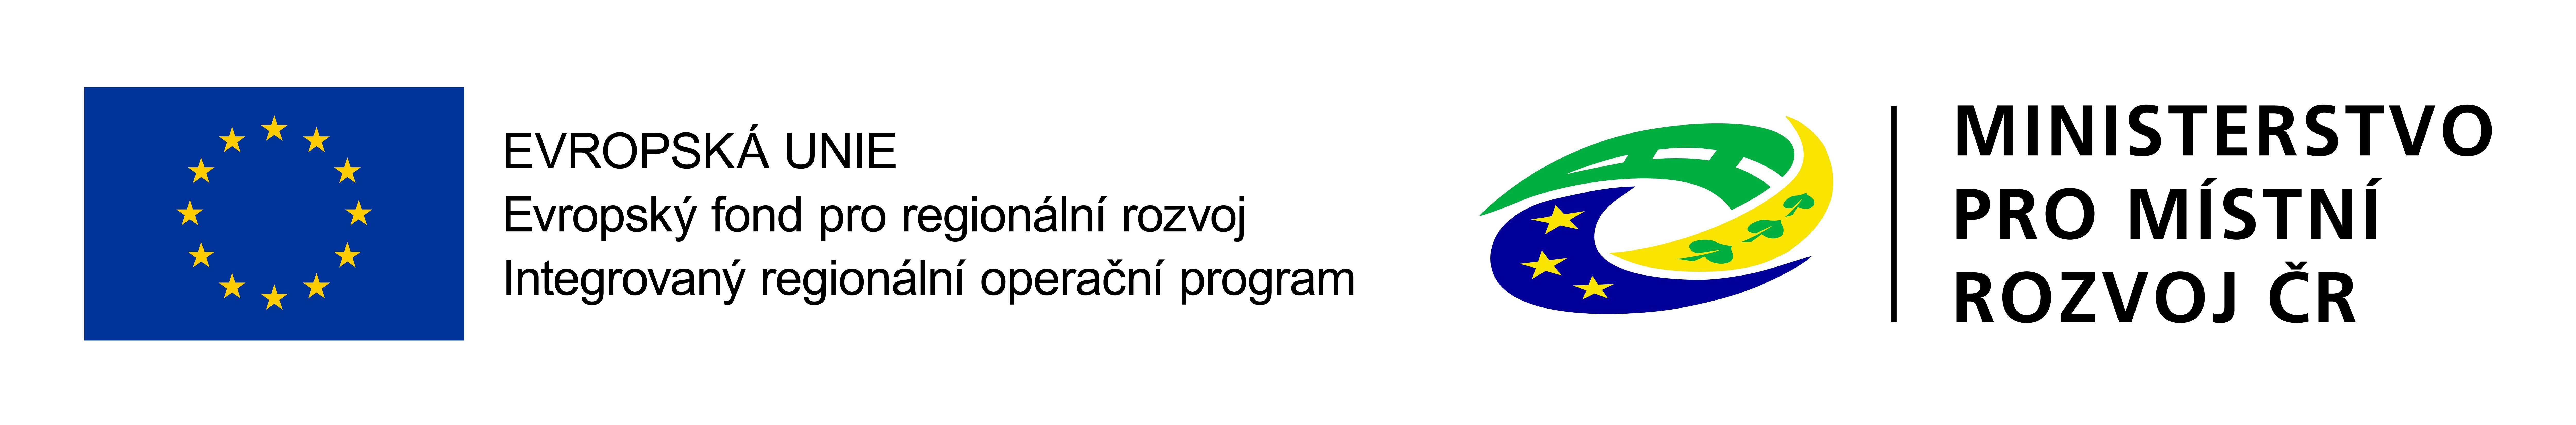 Projekty publicita 2020 logo